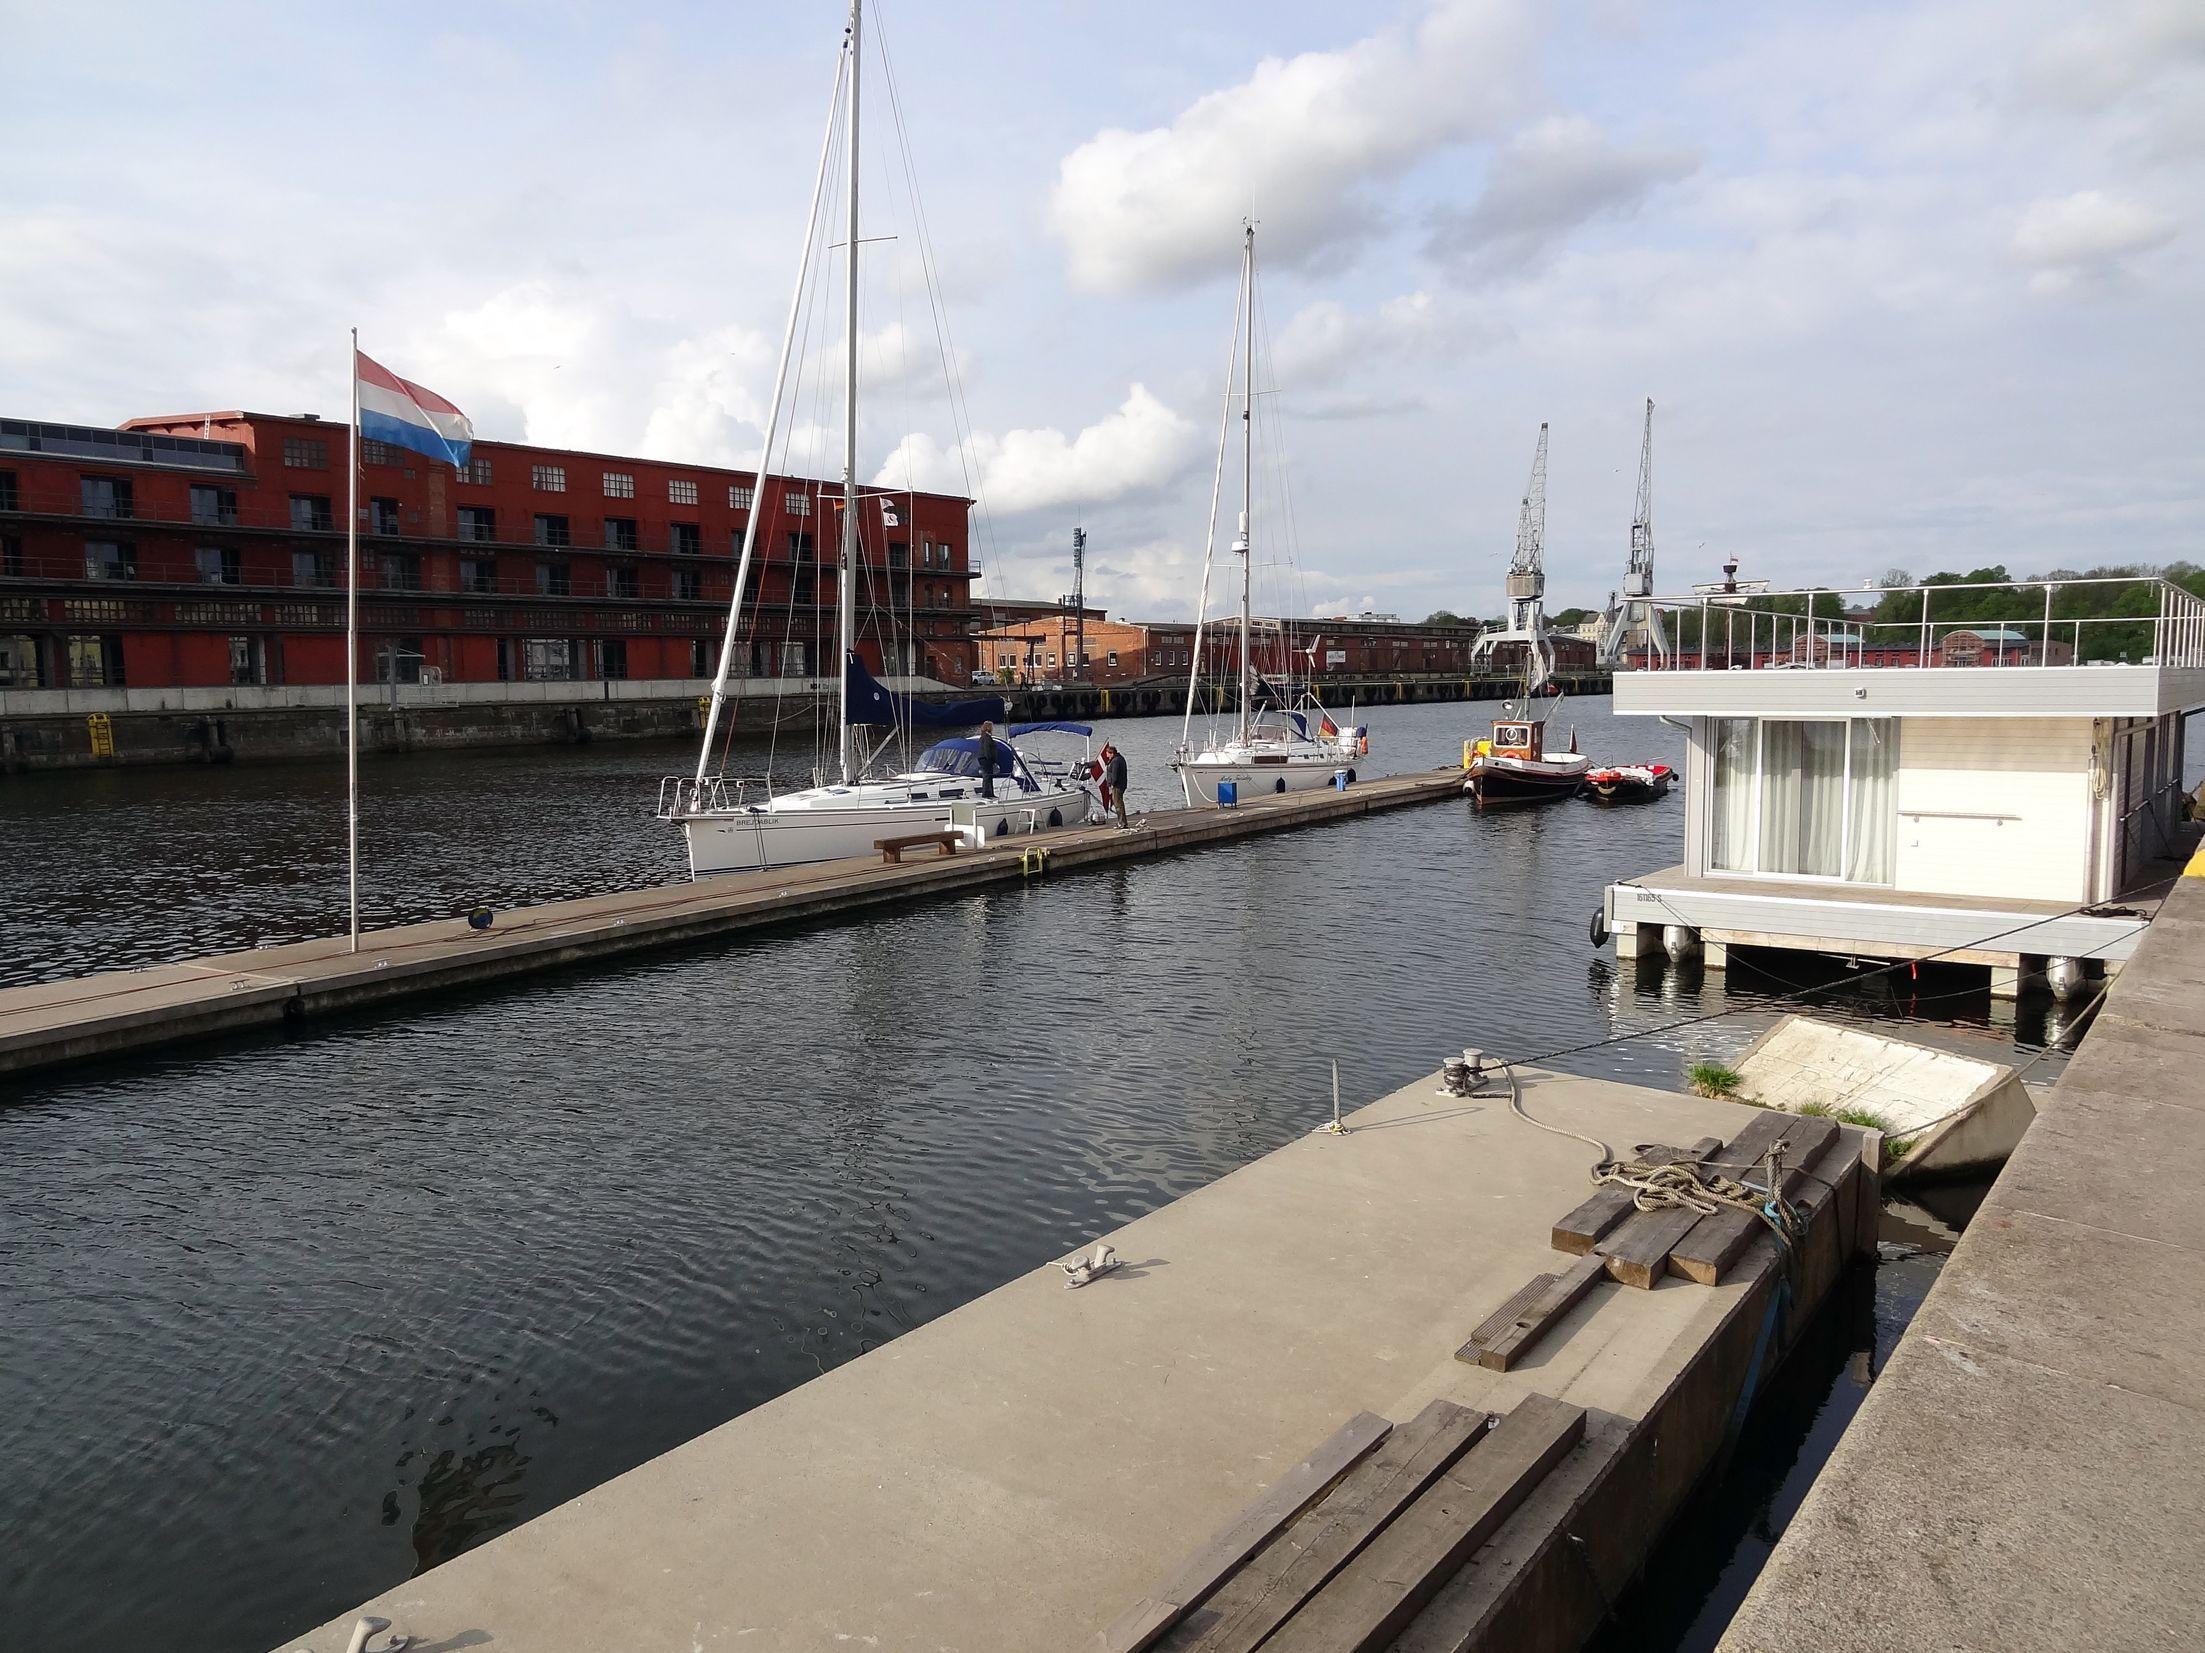 Hansa Marina in Lübeck